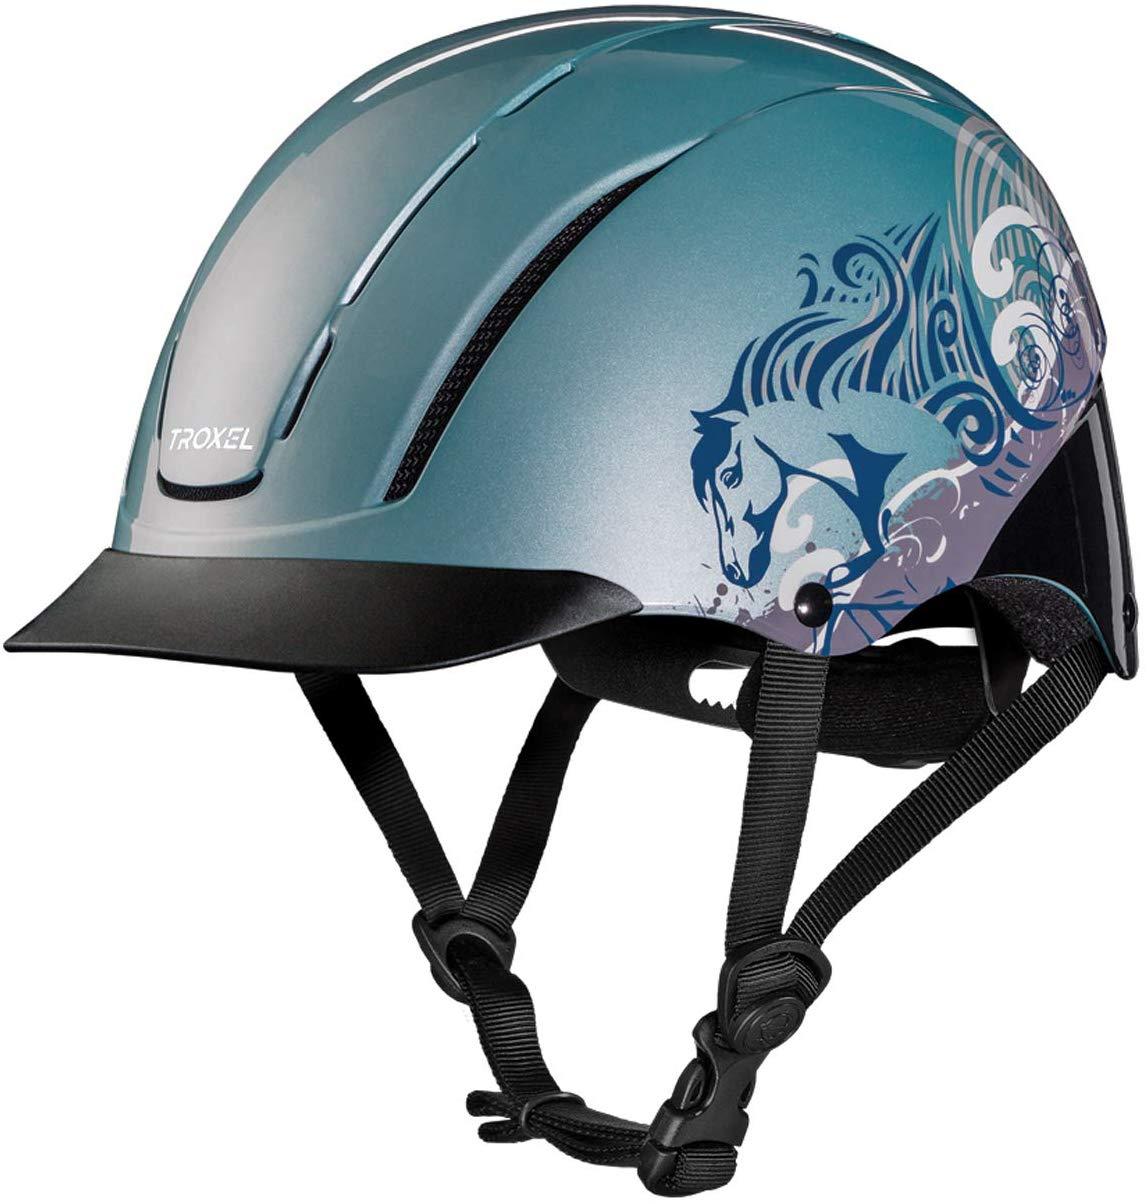 Troxel Equestrian Helmet